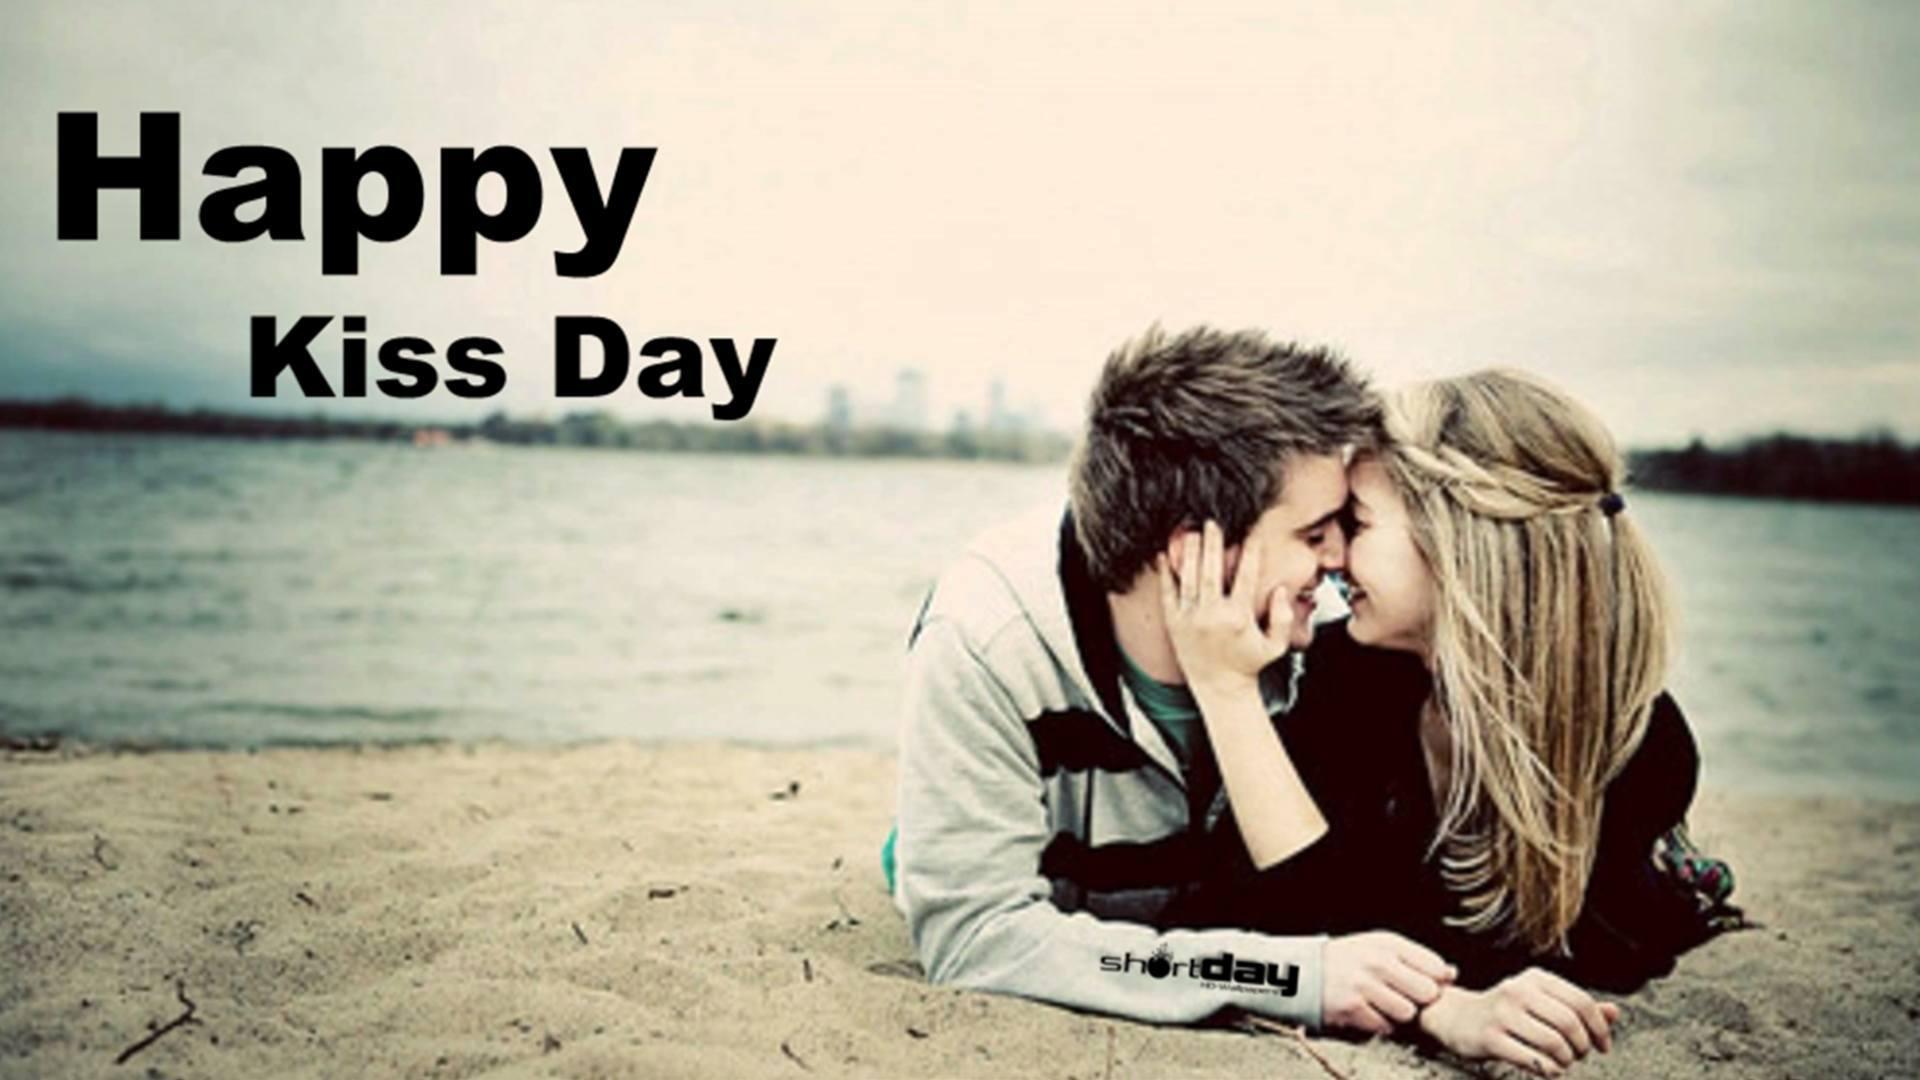 Romantic kiss sms for boyfriend